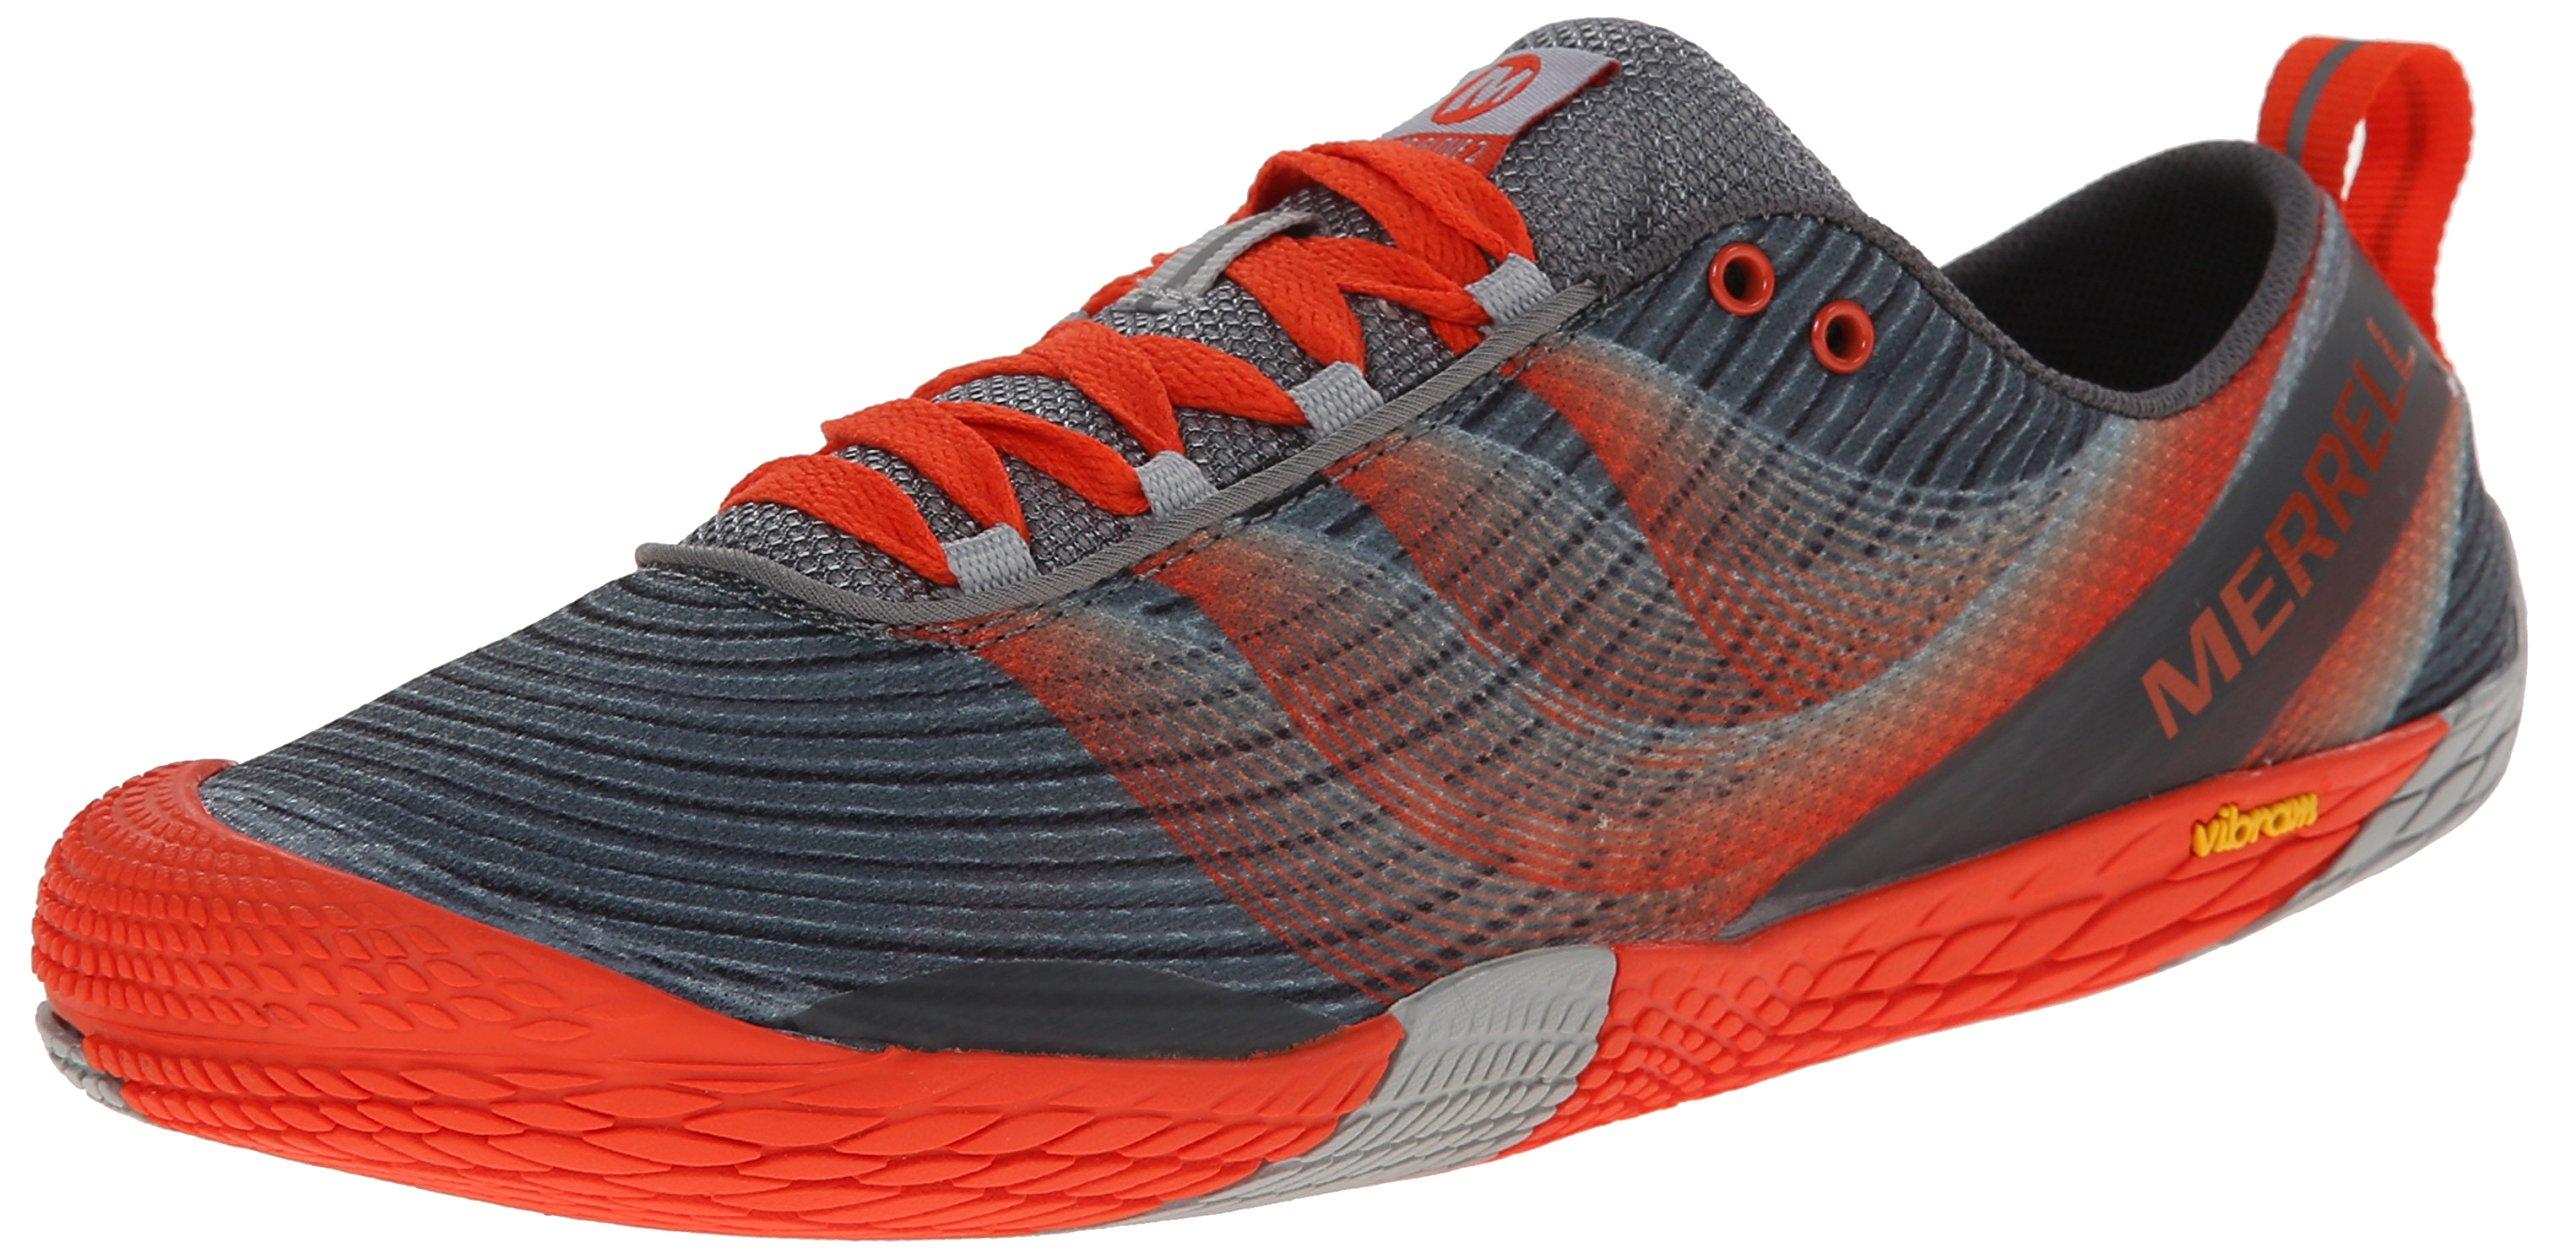 Merrell Men's Vapor Glove 2 Trail Running Shoe, Grey/Spicy Orange, 11 M US by Merrell (Image #1)